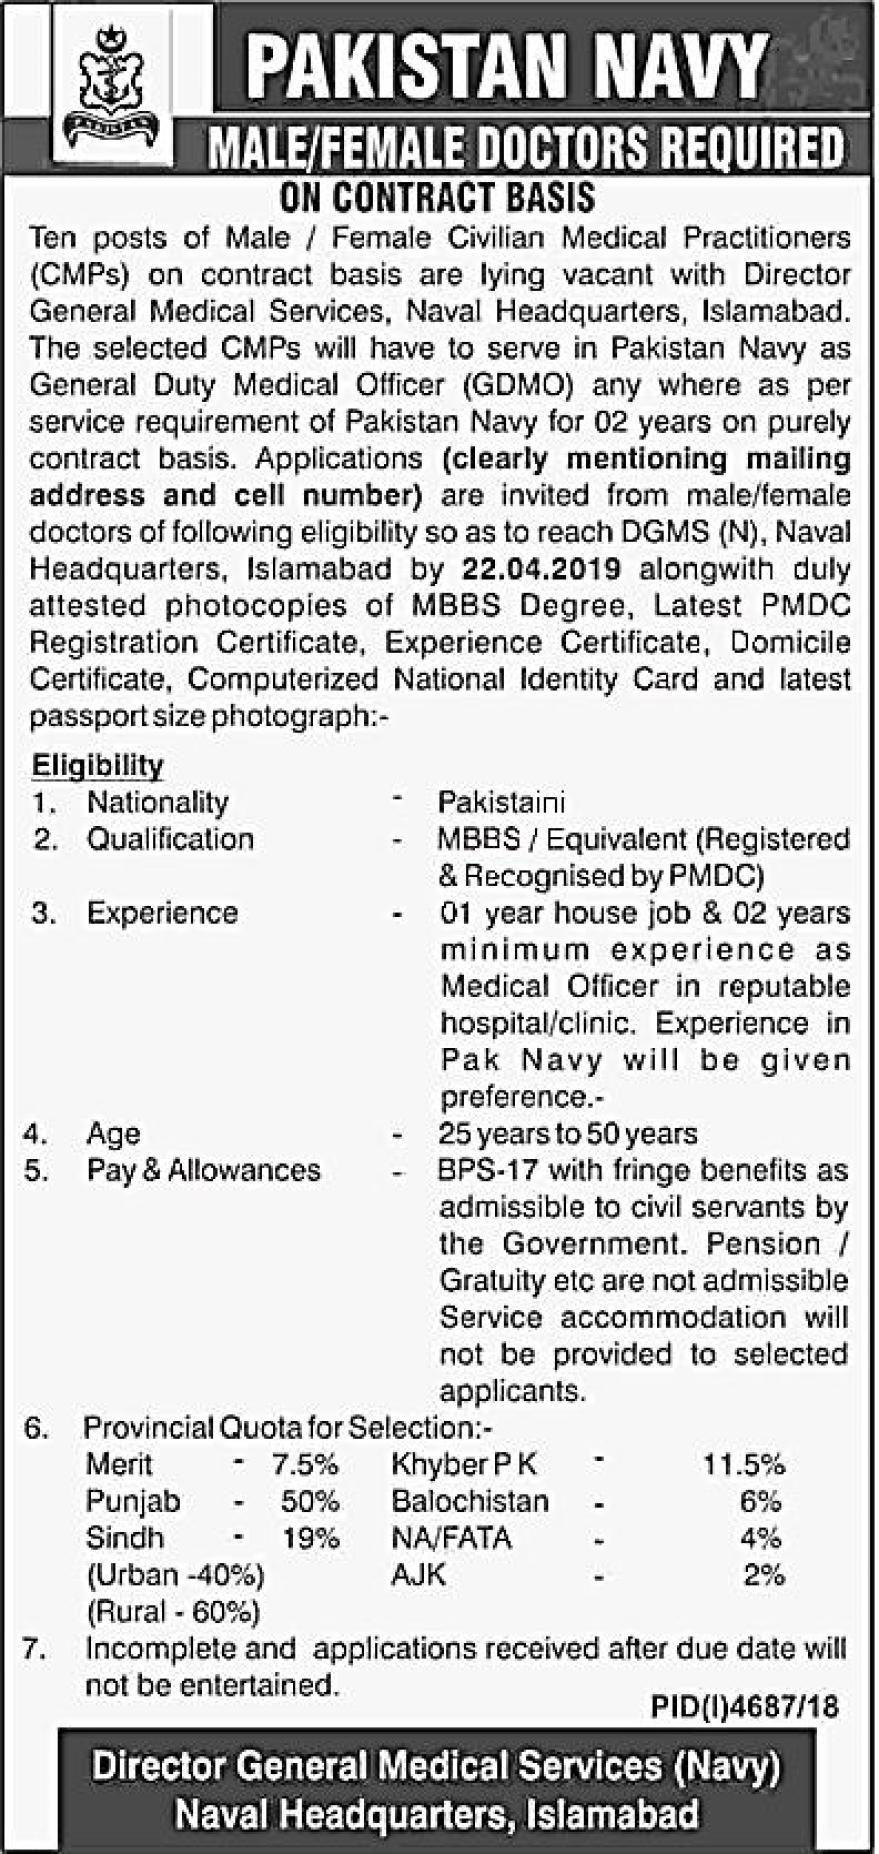 Jobs in Pakistan Navy Medical Officer GDMO